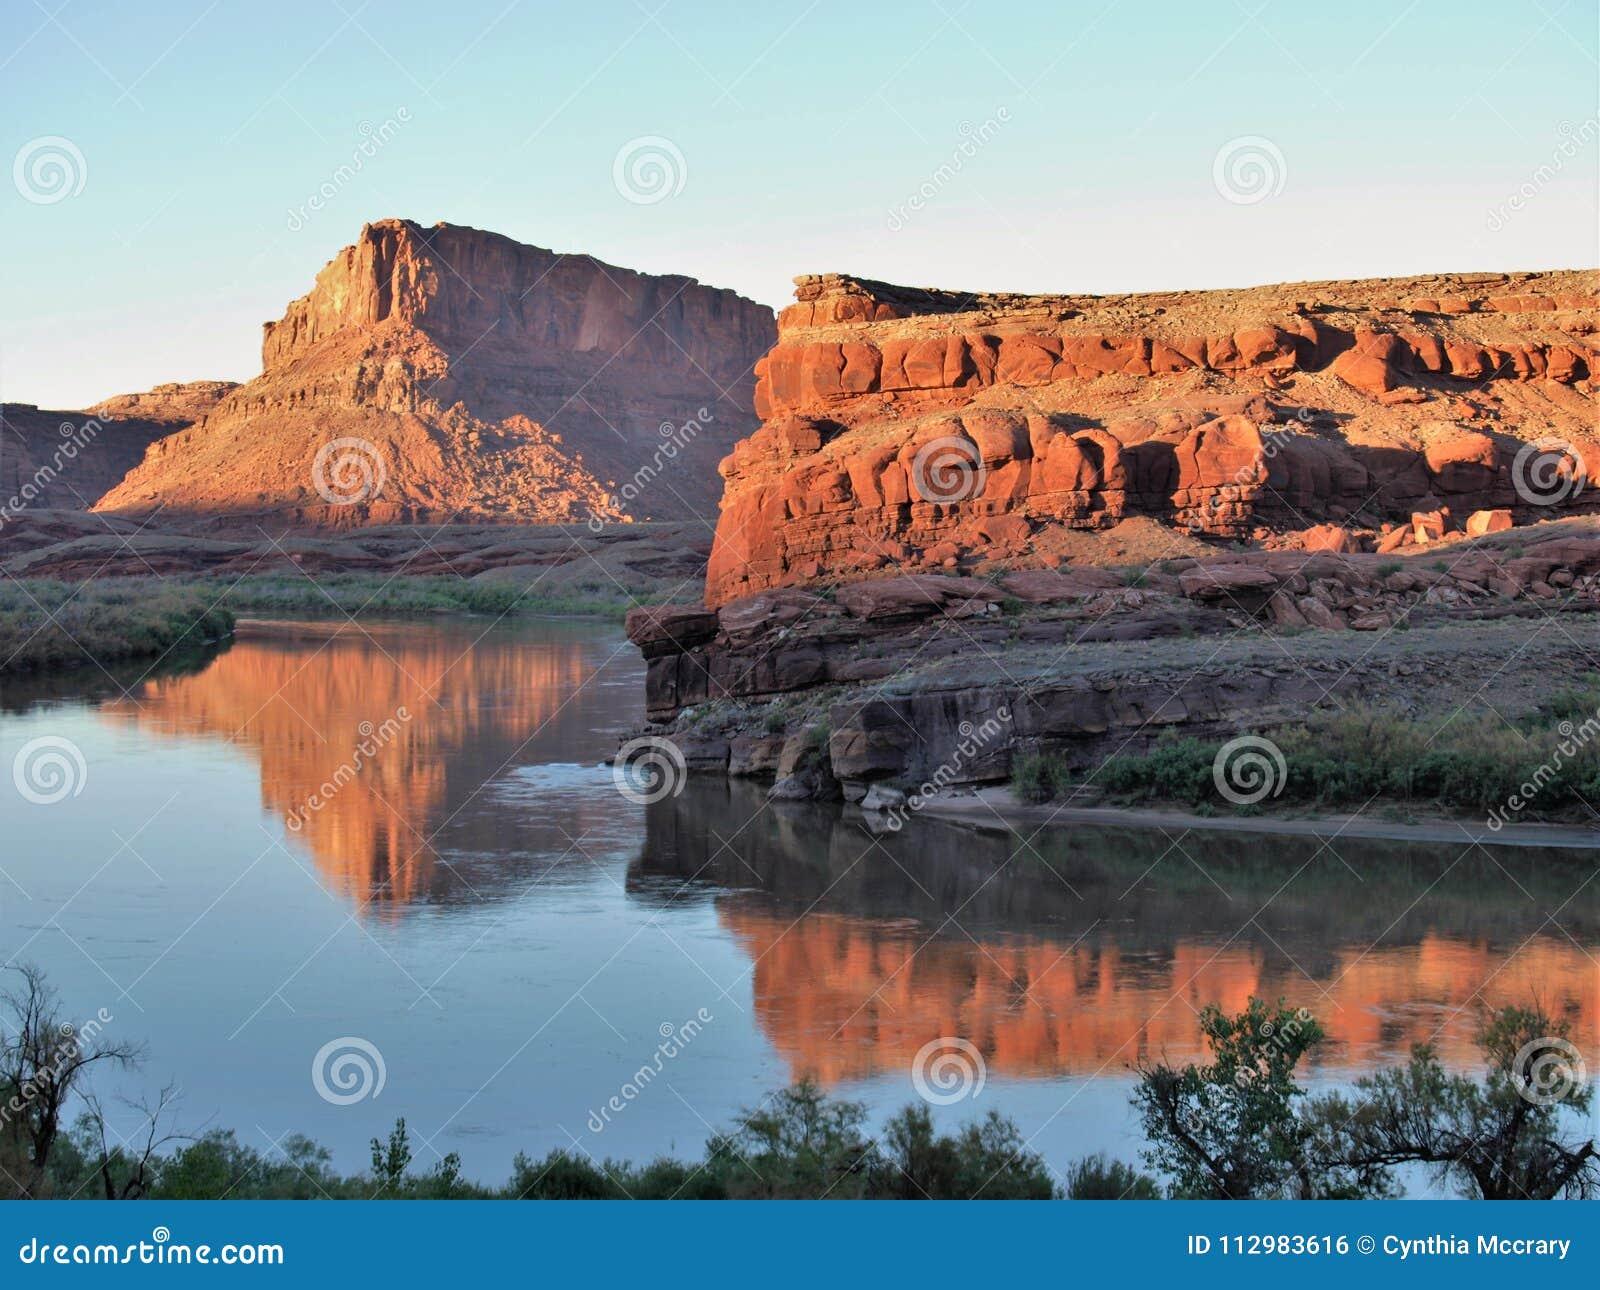 Colorado River Sunset Reflections near Moab